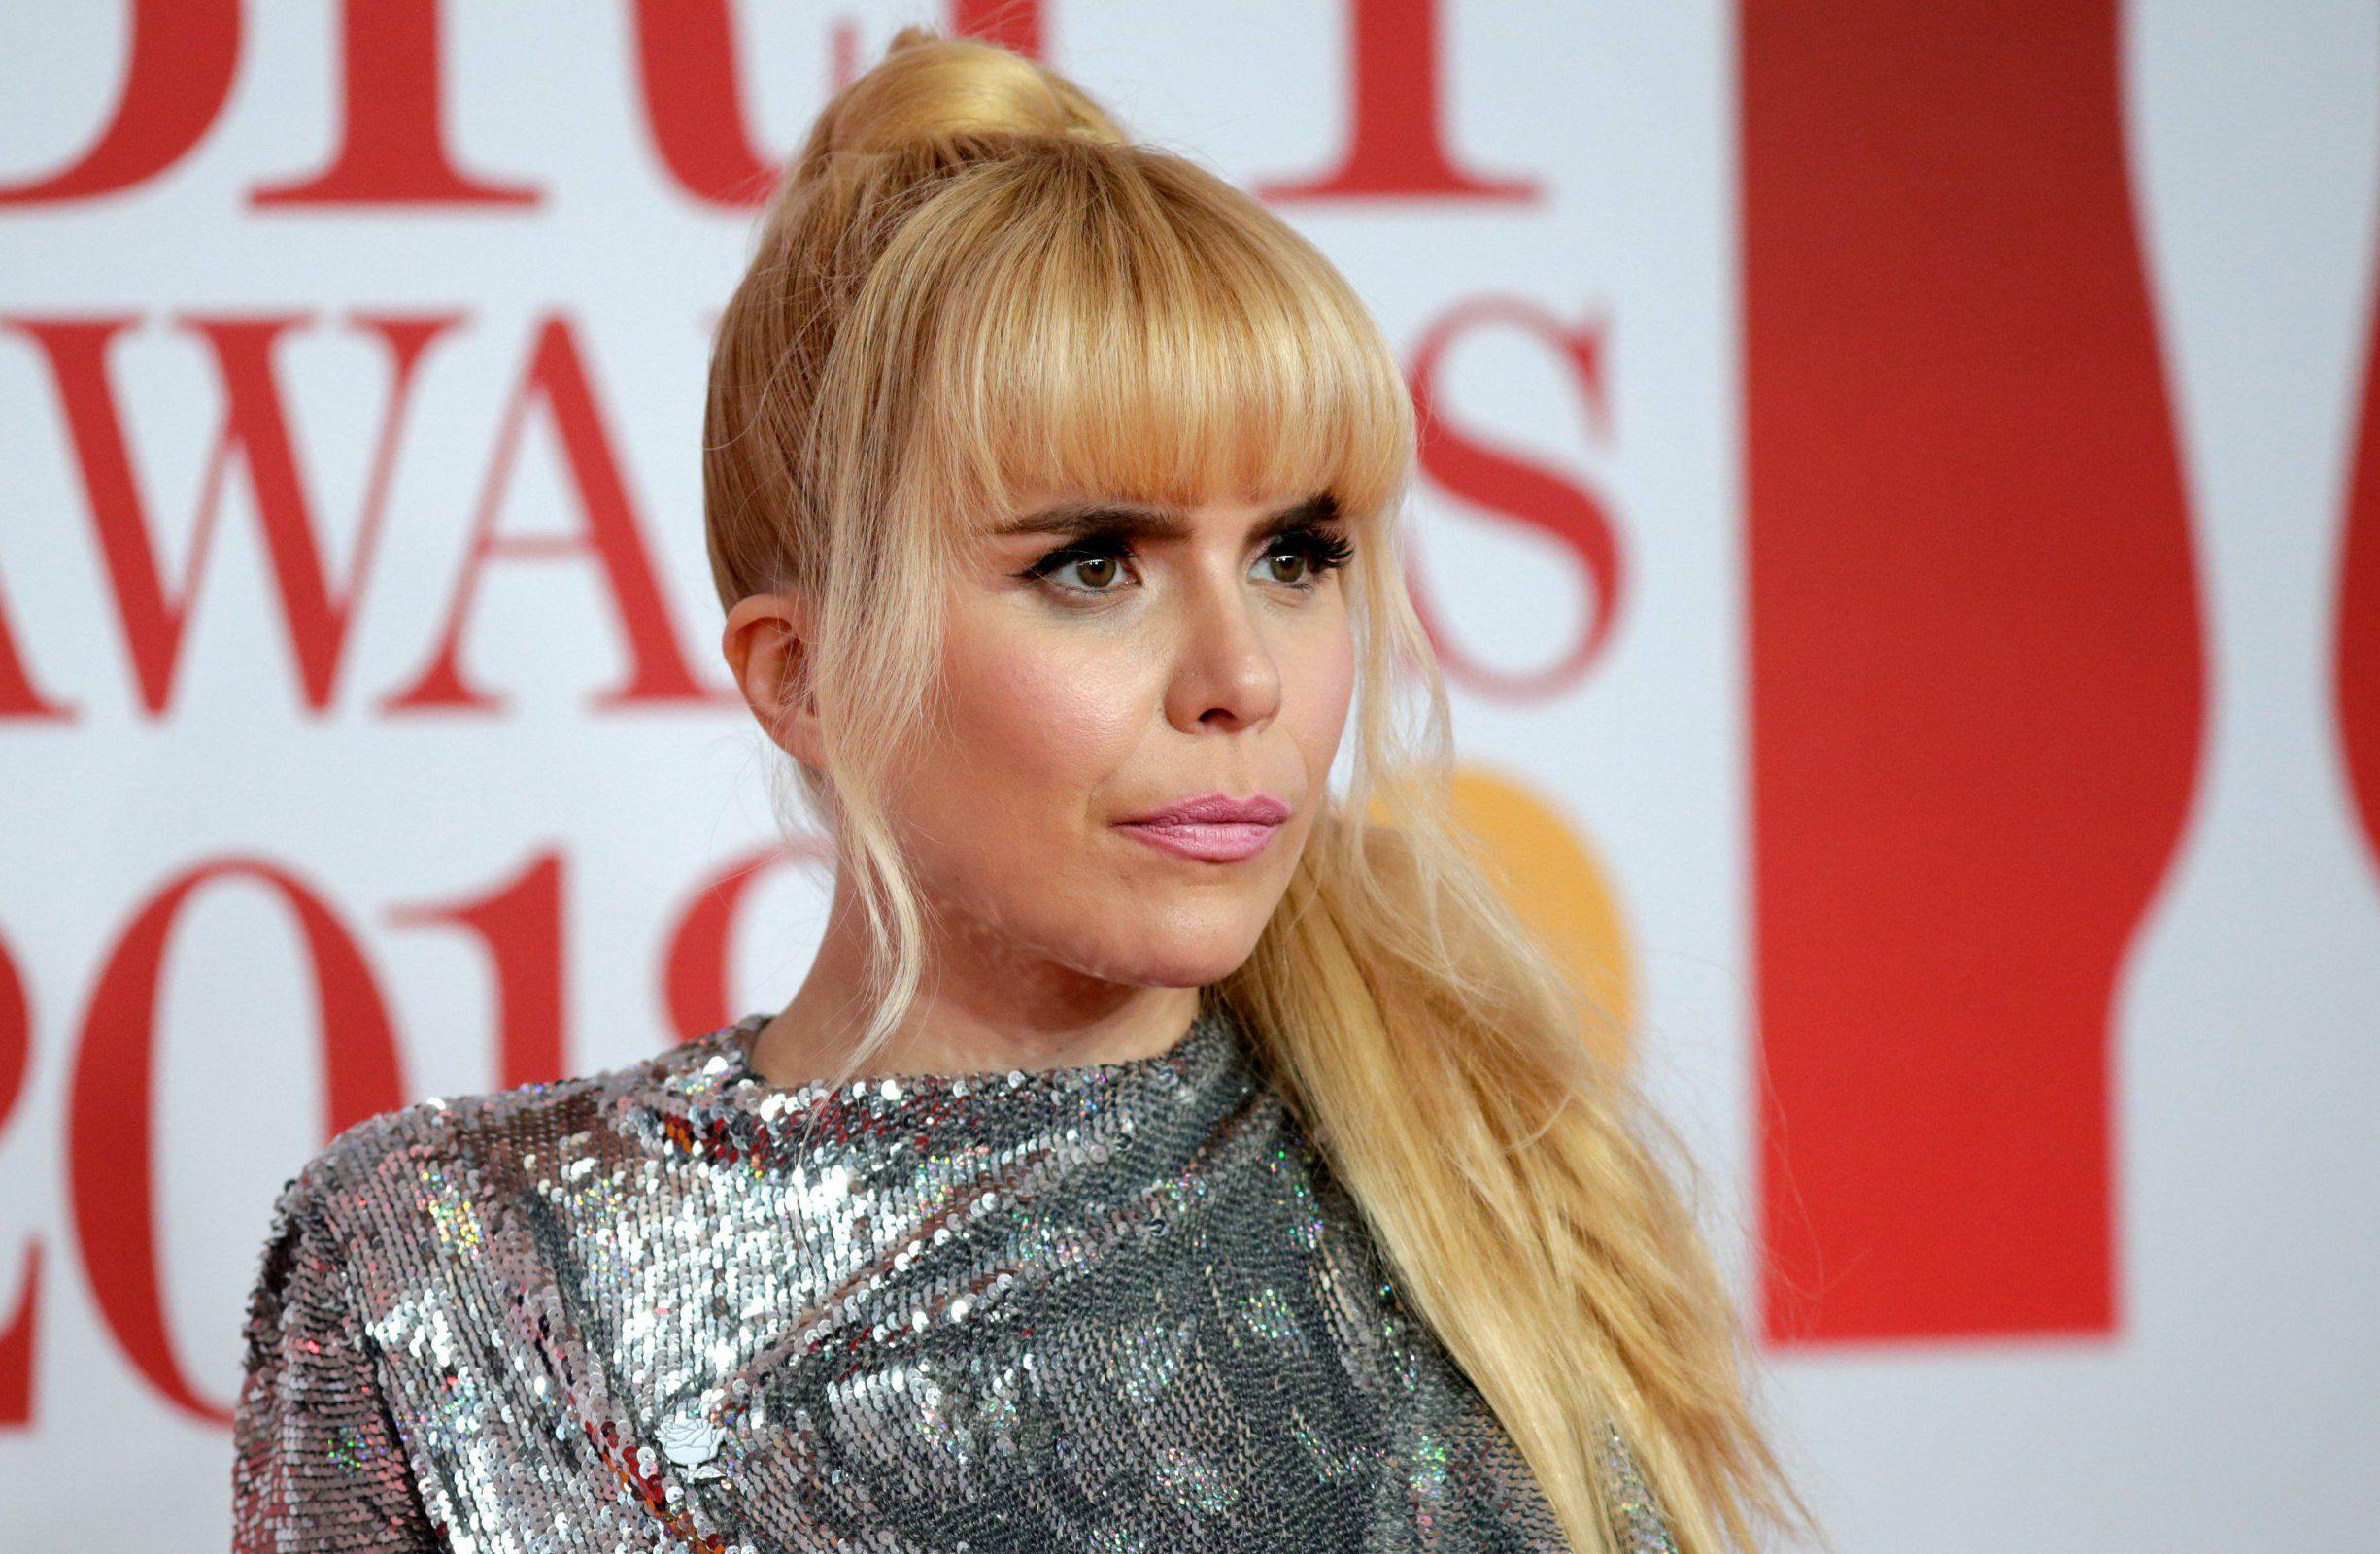 Paloma Faith has revealed she would 'consider' returning to The Voice